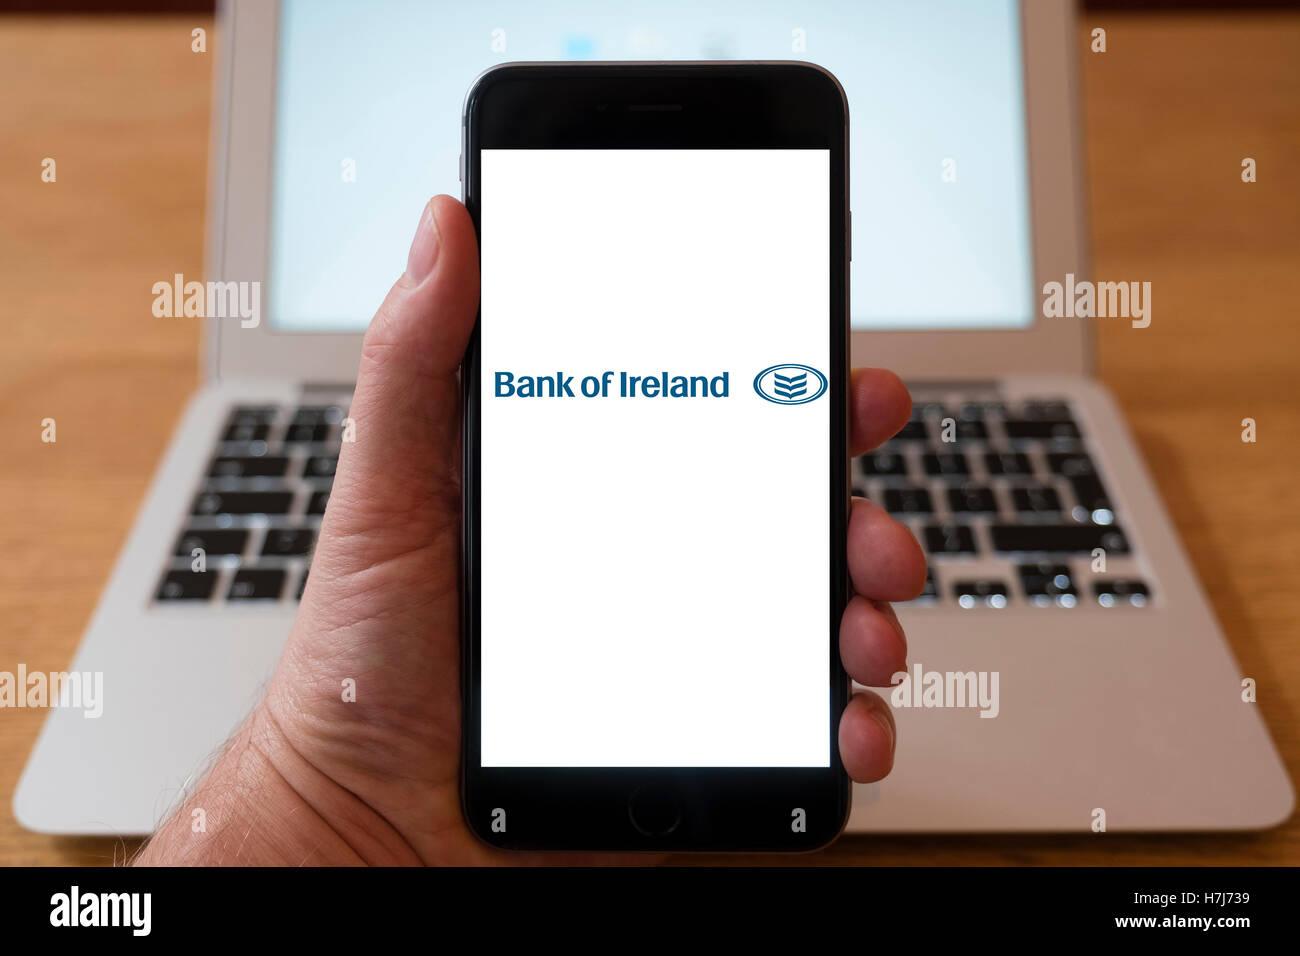 Using iPhone smartphone to display logo of Bank of Ireland - Stock Image